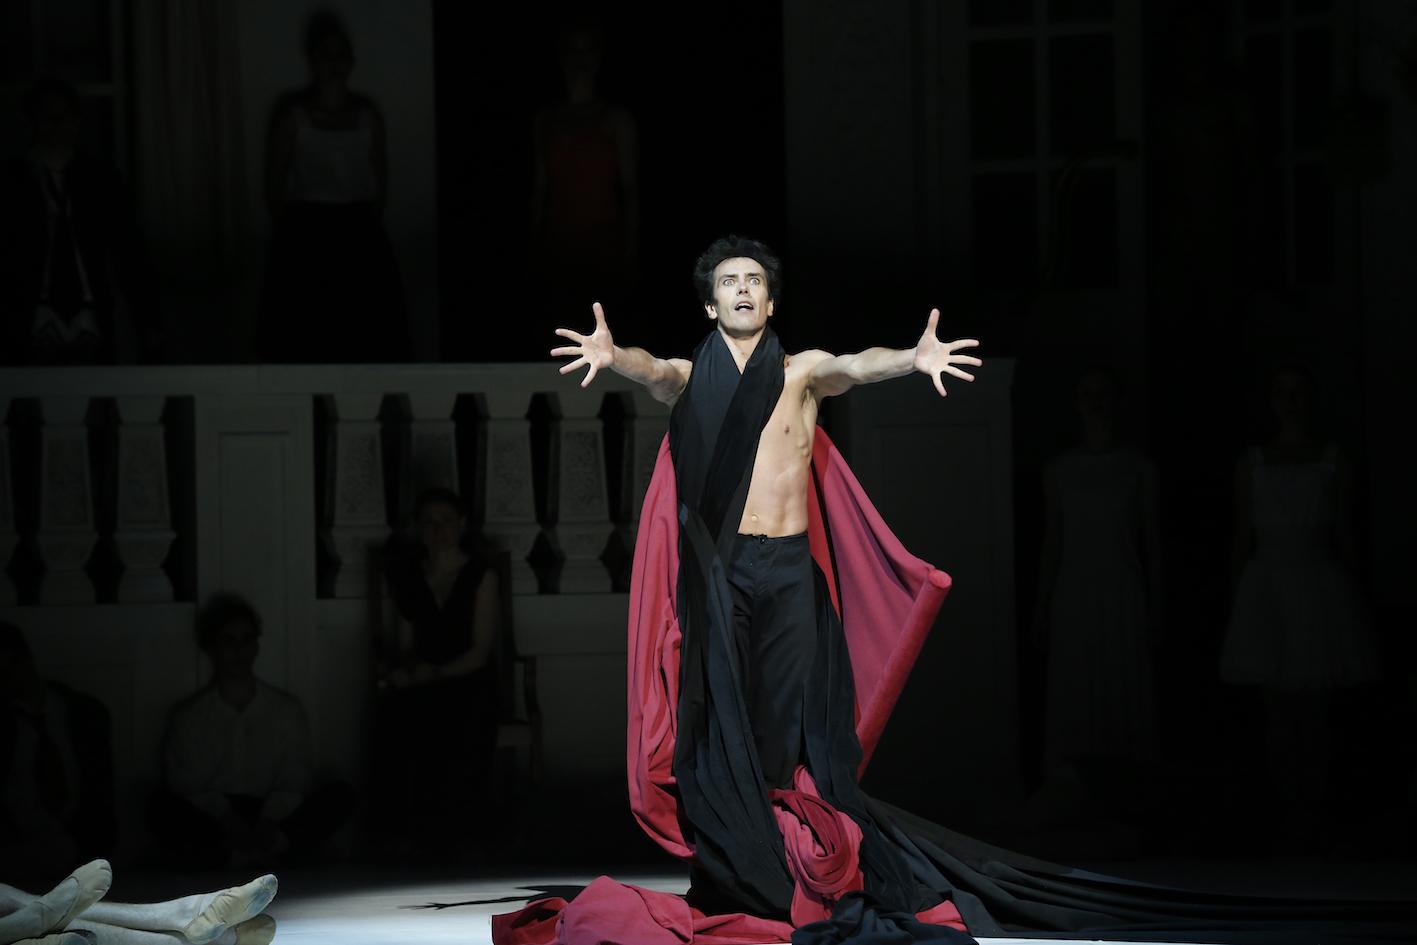 nijinsky-the-australian-ballet-alexandre-riabkosimonparrismaninchairnijinsky-the-australian-ballet-alexandre-riabkonijinsky-the-australian-ballet-leanne-stojmenov-alexandre-riabkonijinsky-the-australian-ballet-dimity-azoury-alexandre-riabko-francois-eloi-lavignac-leanne-stojmenovnijinsky-the-australian-ballet-cristiano-martinonijinsky-the-australian-ballet-leanne-stojmenov-alexandre-riabko-ako-kondo-christopherrodgers-wilsonnijinsky-the-australian-ballet-alexandre-riabkonijinsky-2016-the-australian-ballet-kevin-jacksonnijinsky-2016-the-australian-ballet-kevin-jackson-amy-harrisnijinsky-2016-the-australian-ballet-andrew-killian-as-petruschkanijinsky-2016-the-australian-ballet-kevin-jackson-natasha-kusch